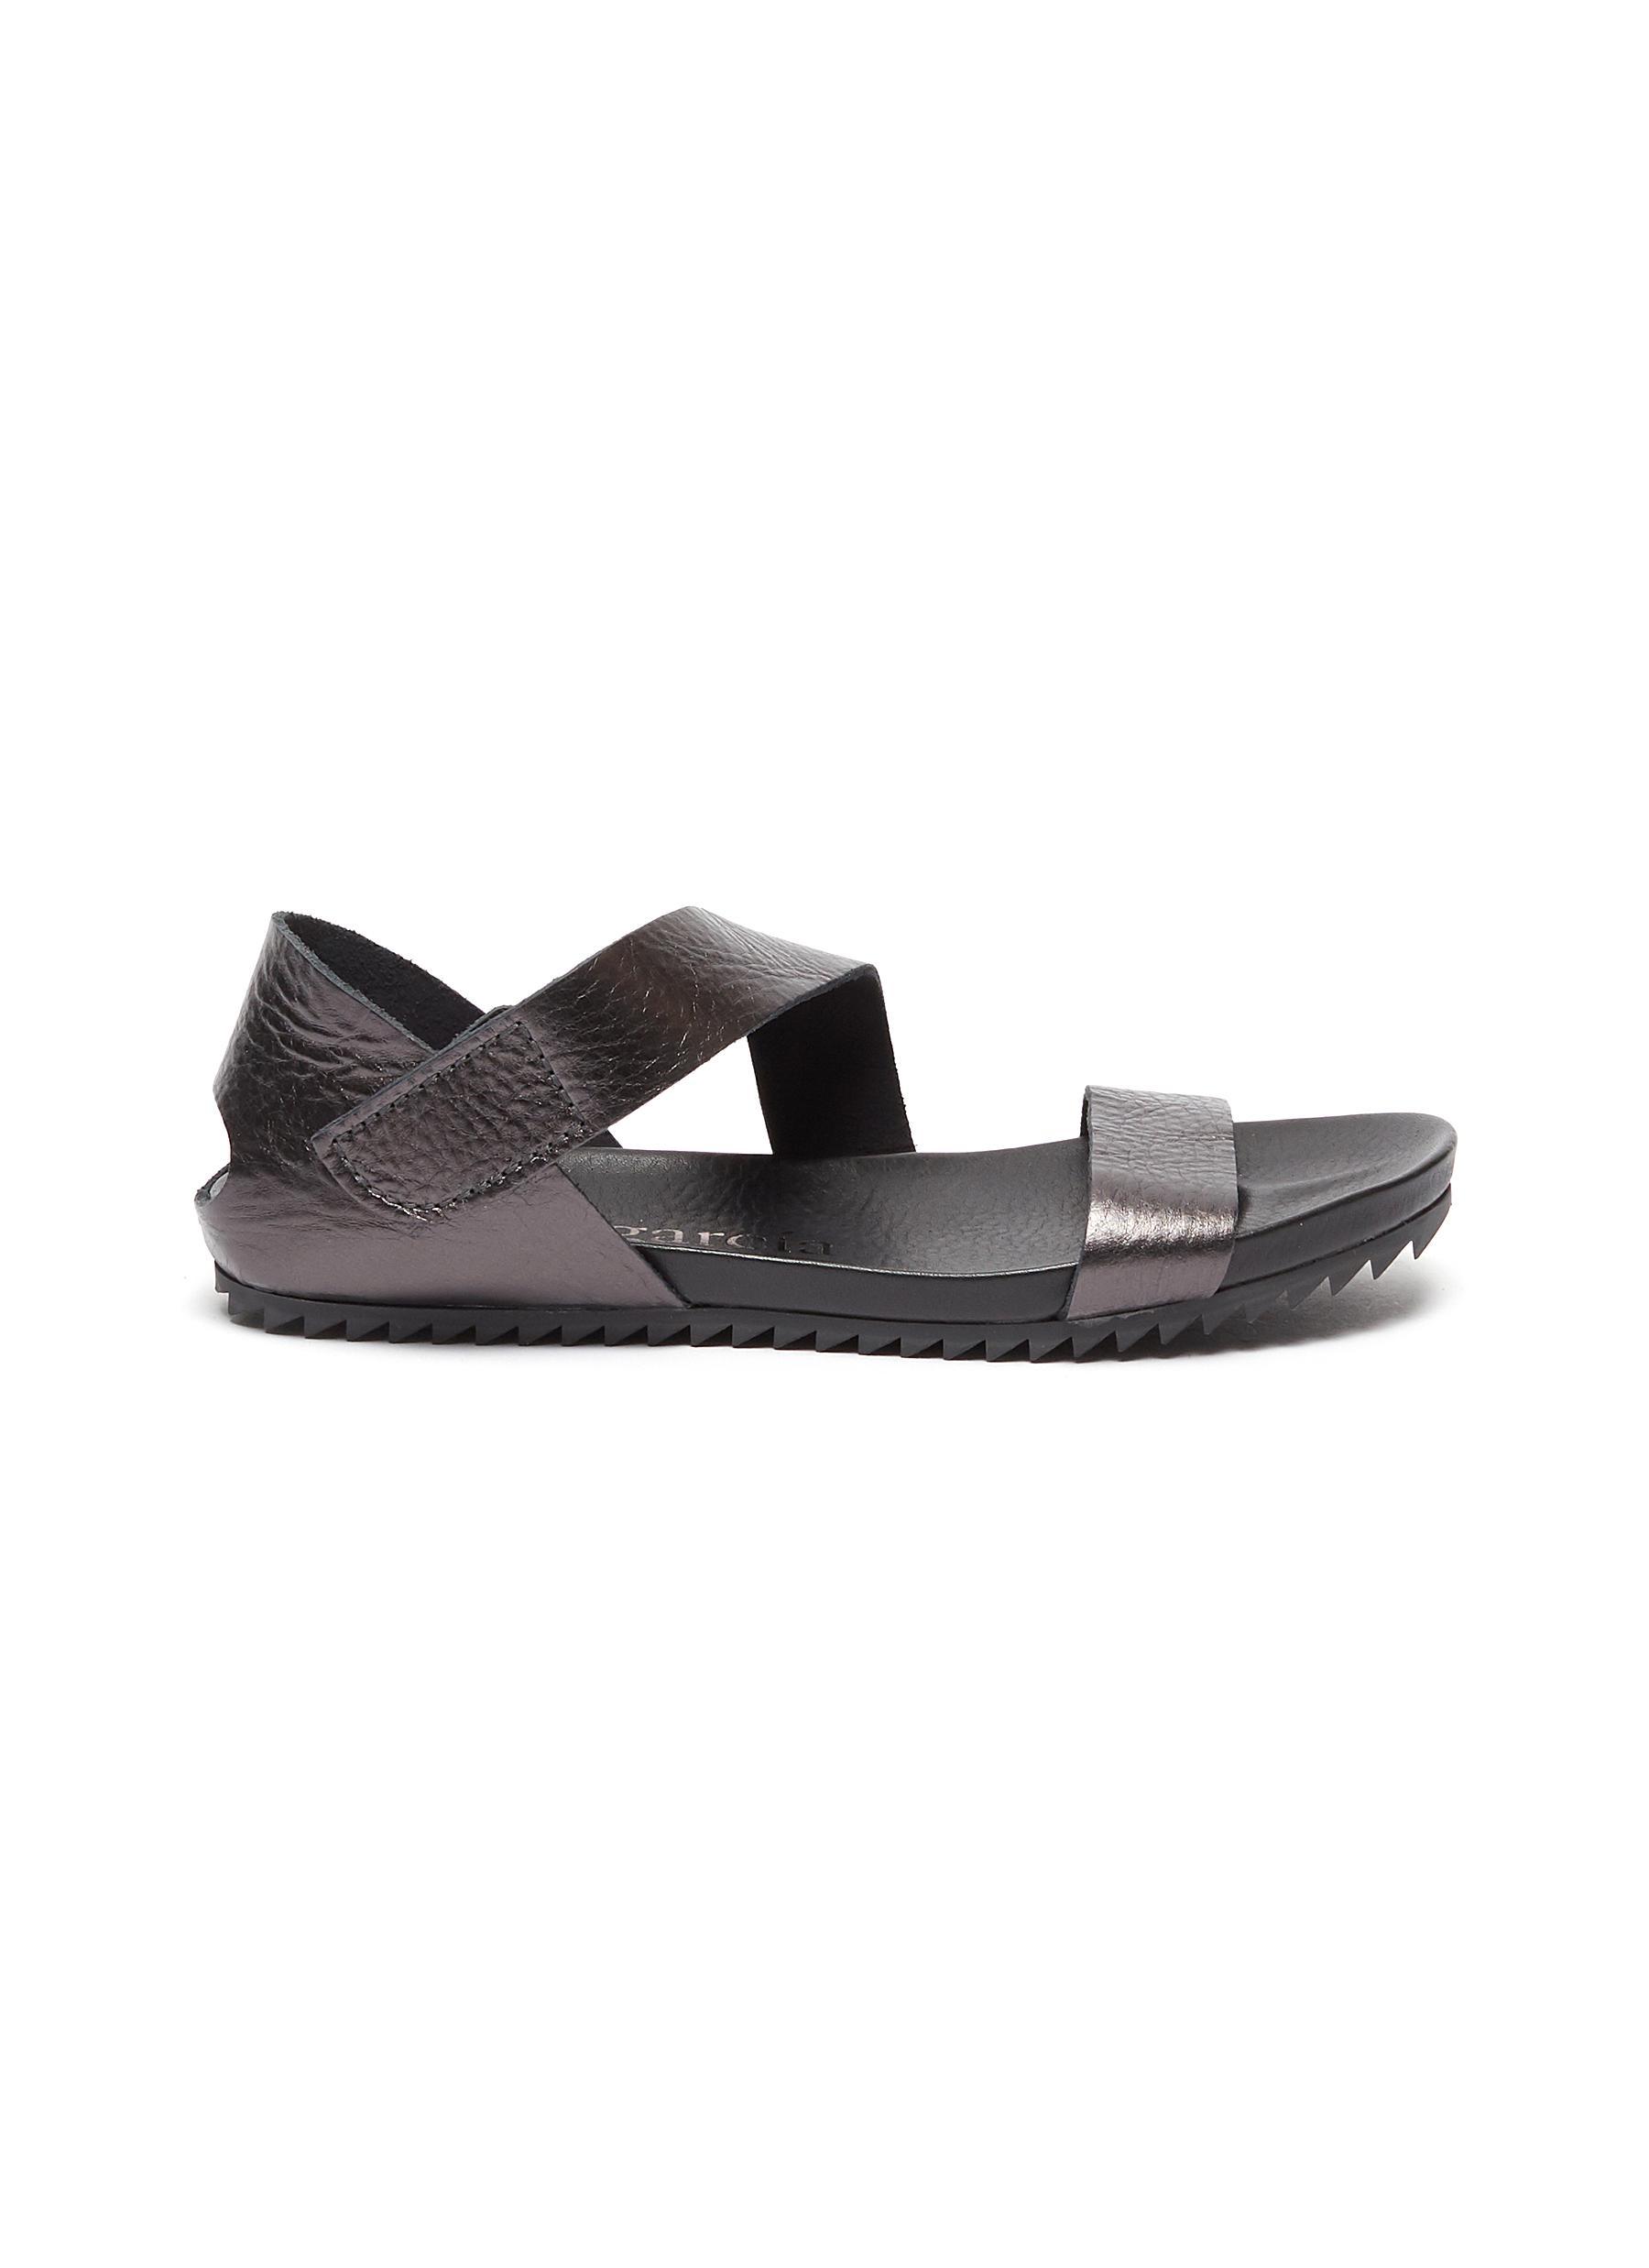 Jo slant strap metallic leather sandals by Pedro García